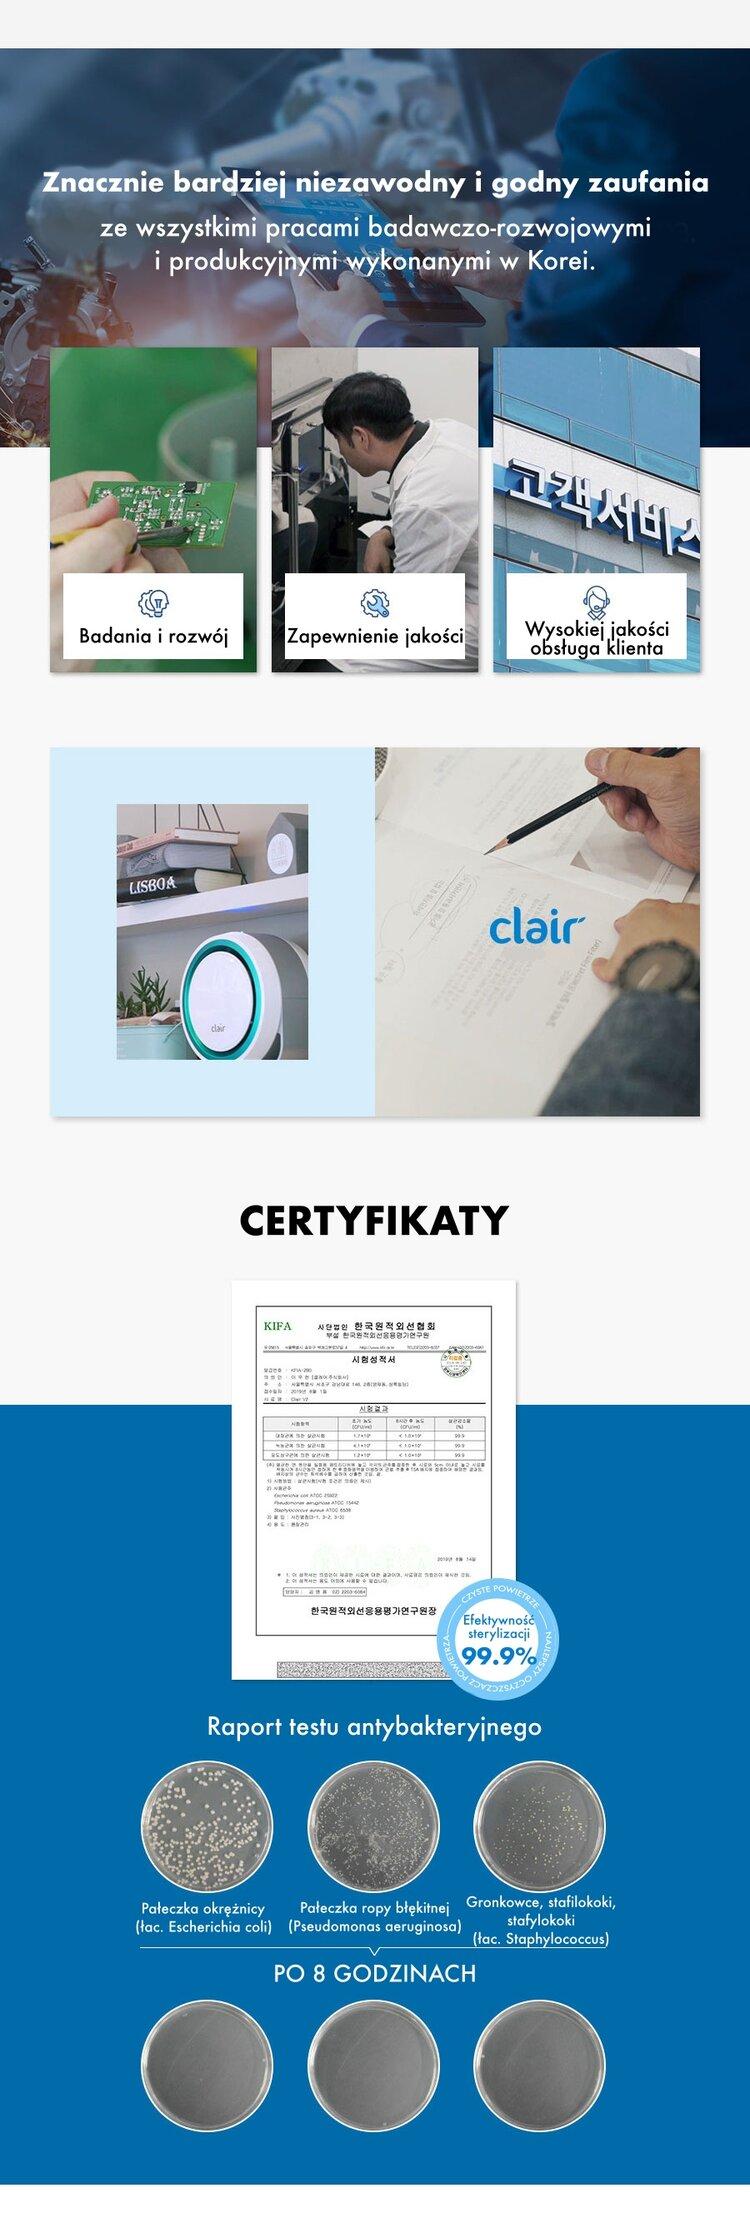 Clair V2 opis-kopia 7.jpg